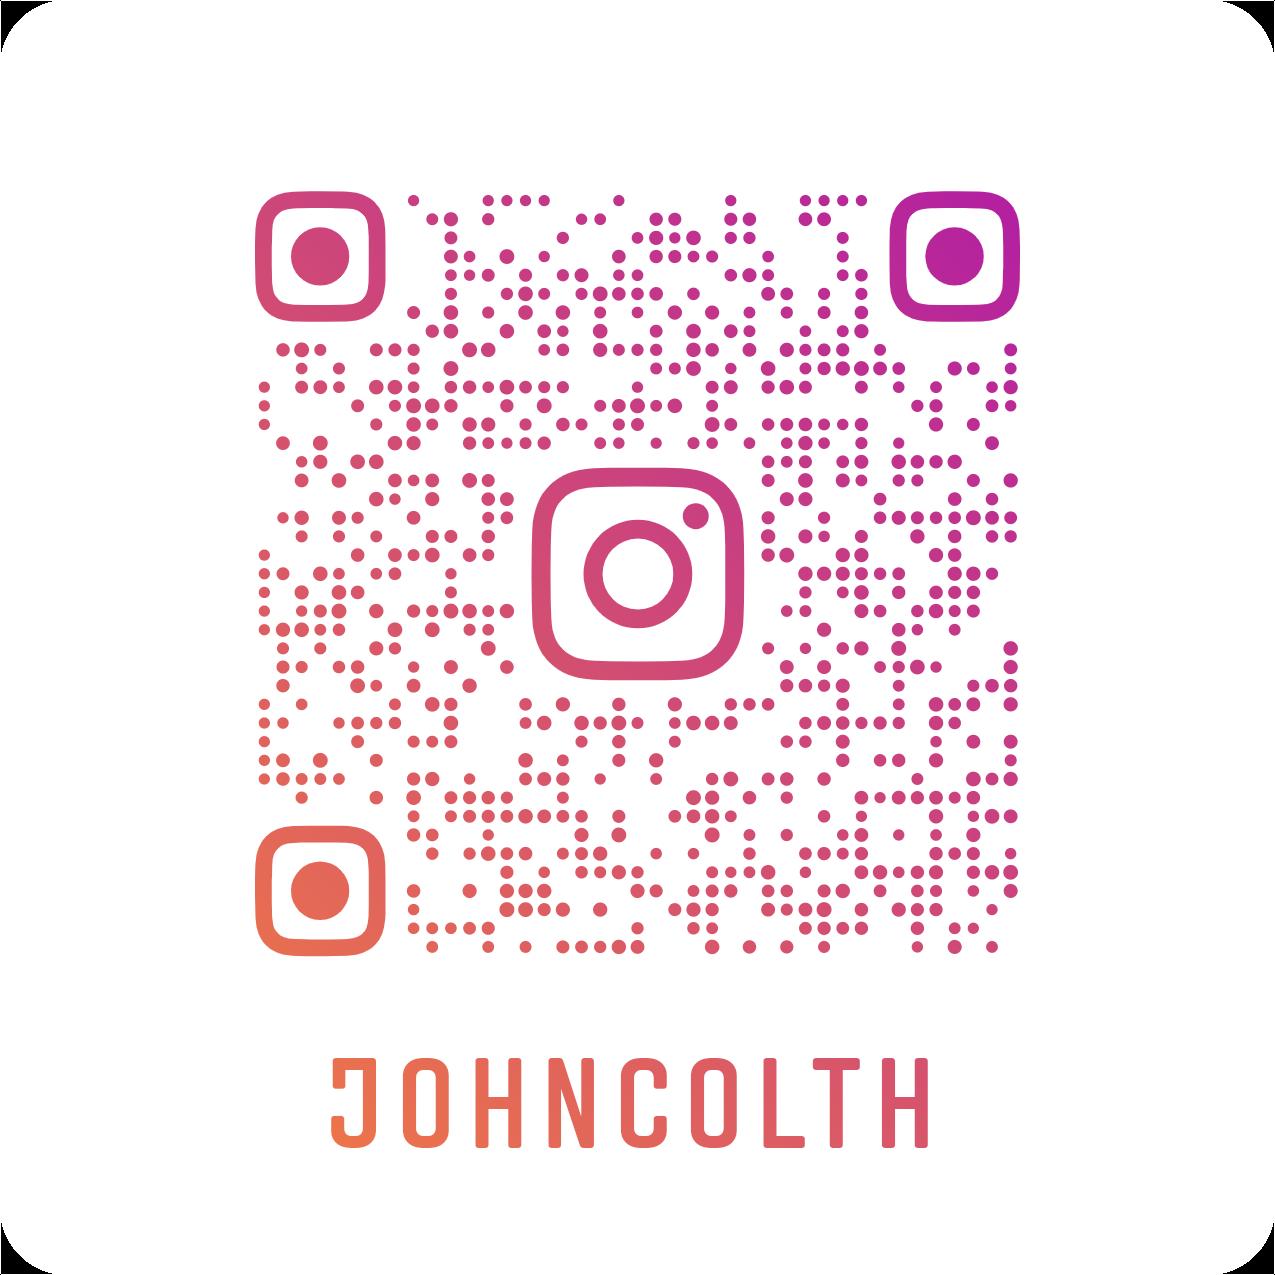 John Colth